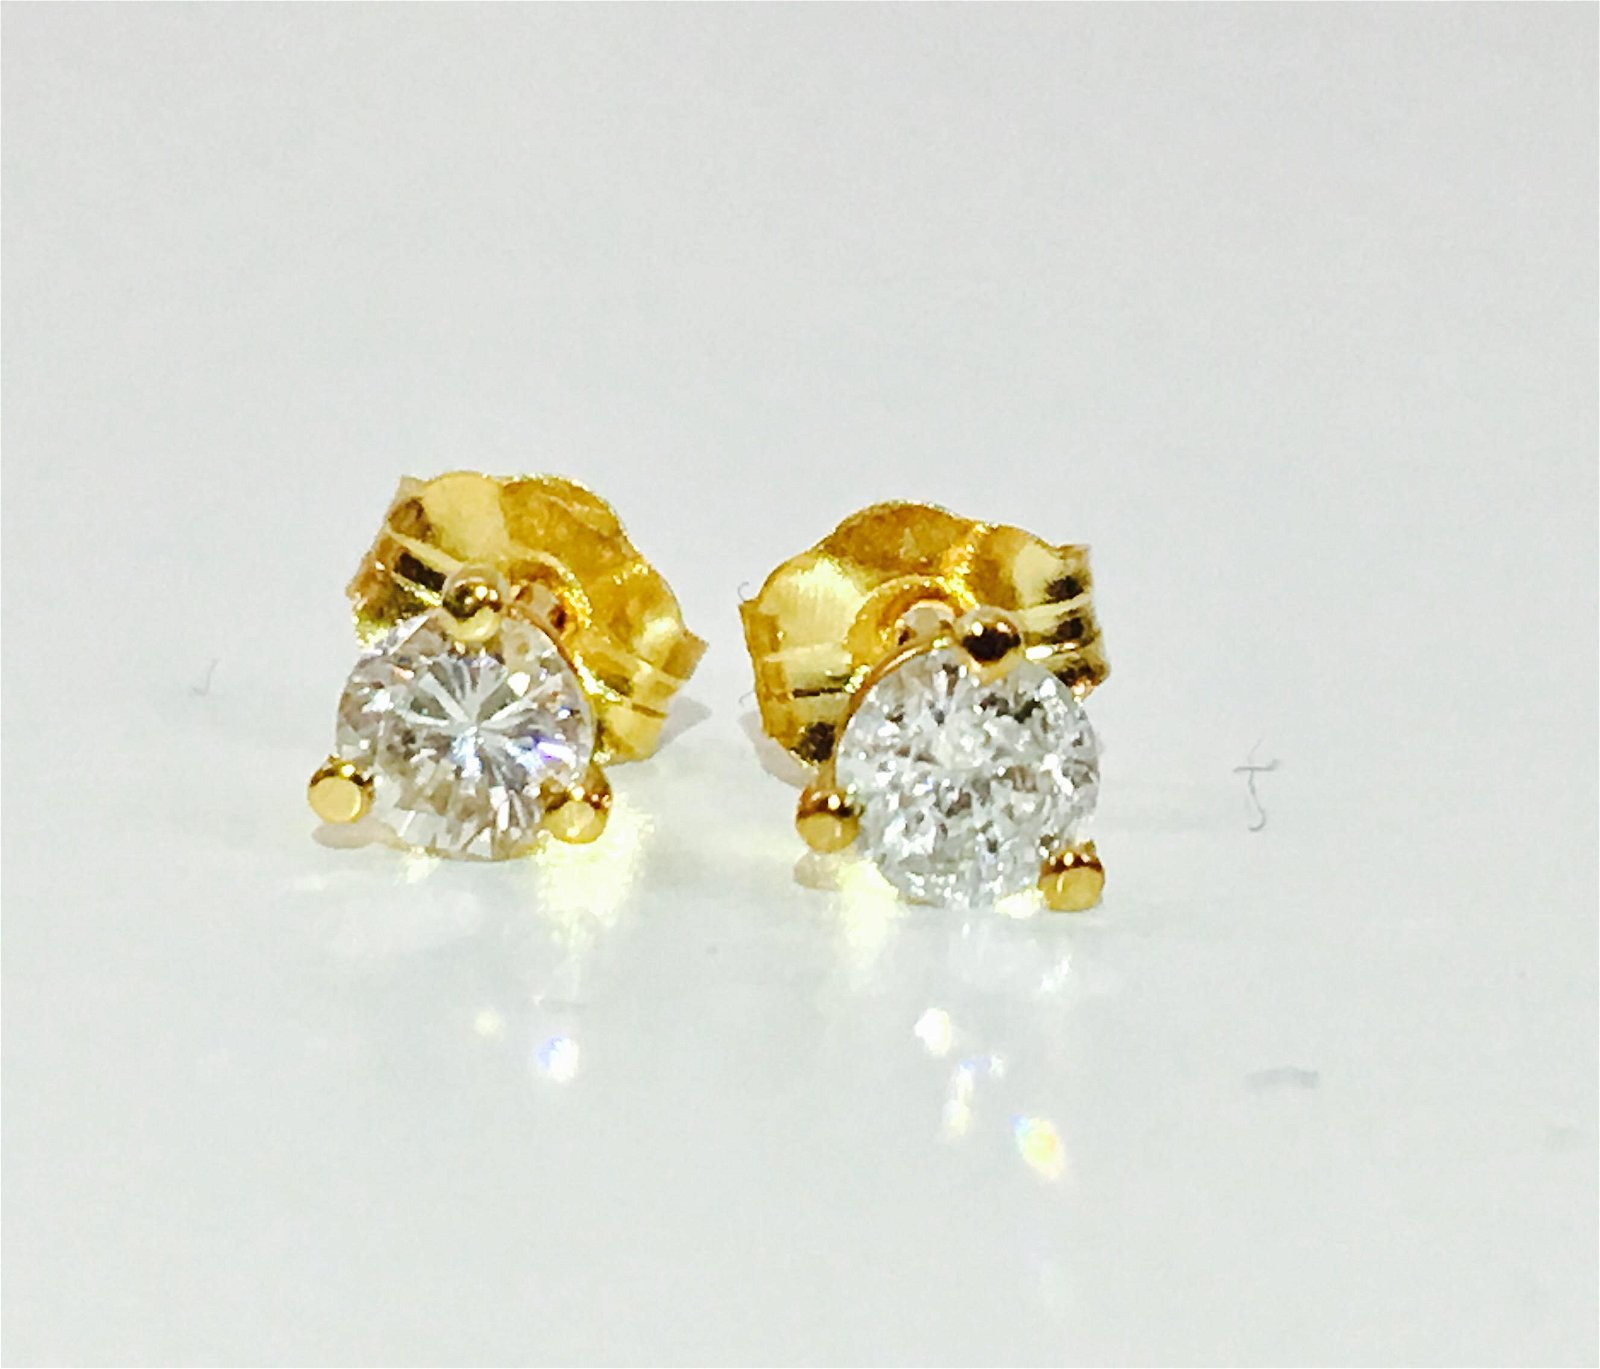 14K Yellow gold, 0.33 CT VS-SI Diamond Studs/earrings